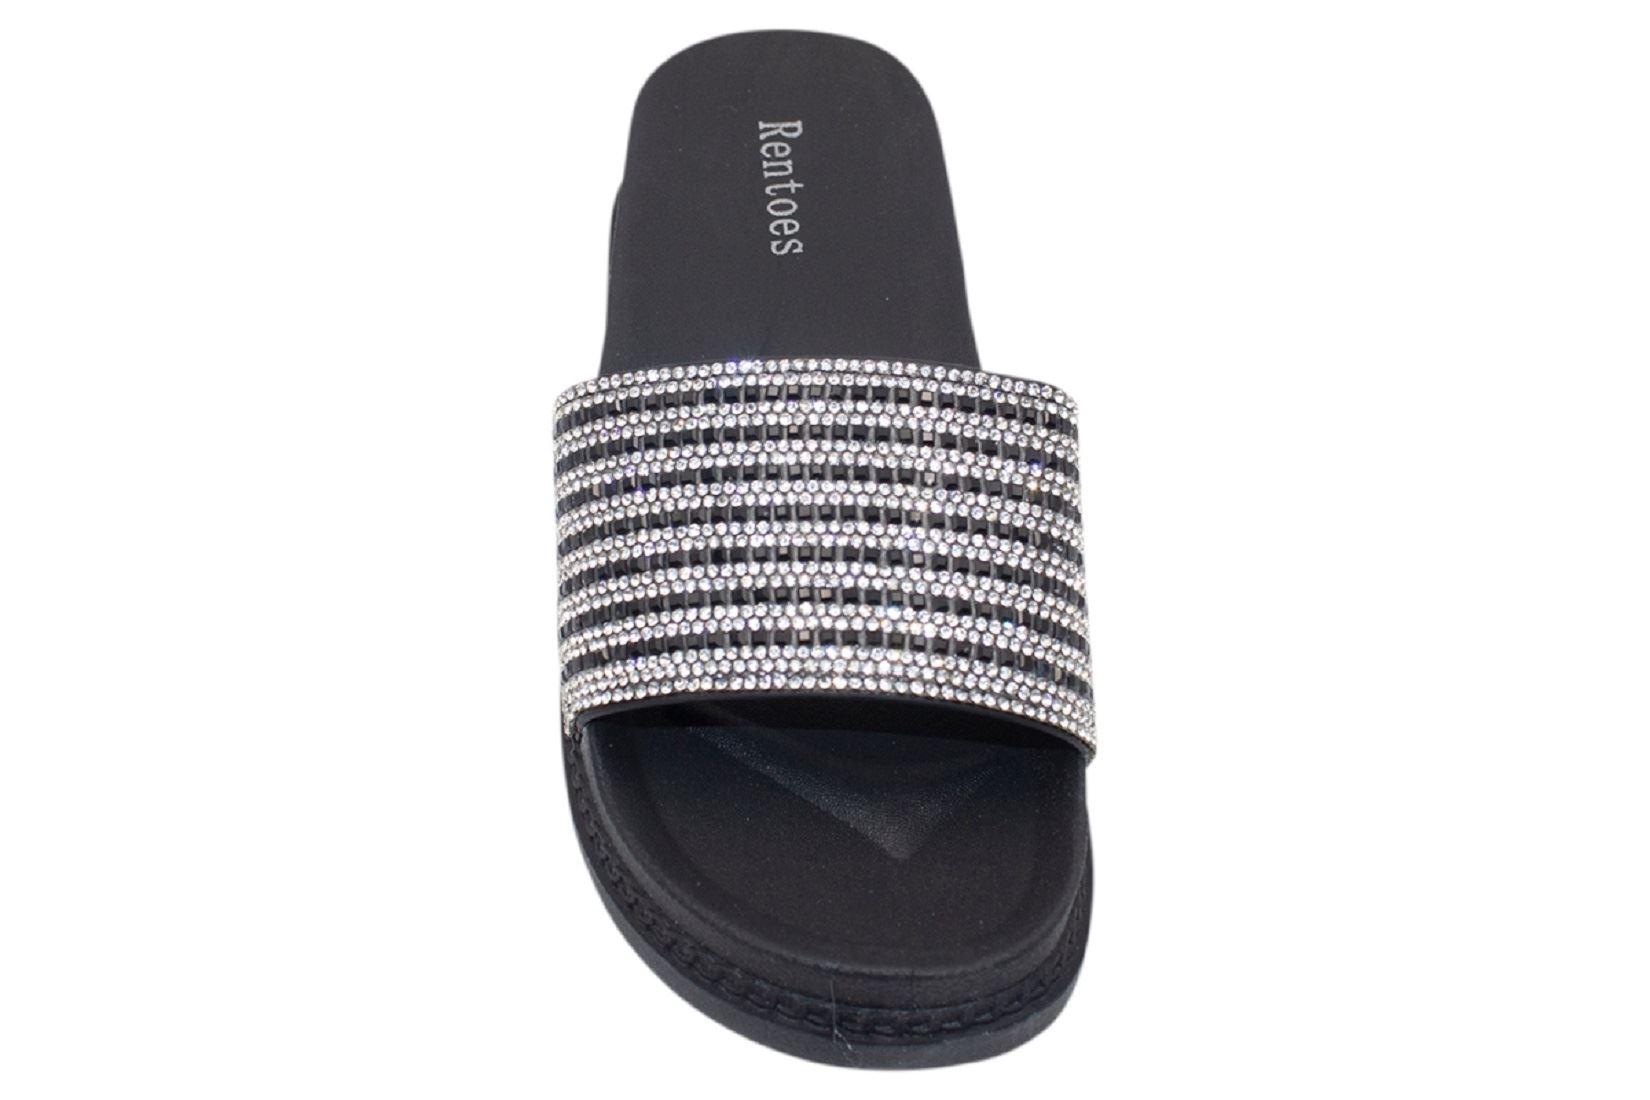 Womens-Sliders-Casual-Slippers-Mules-Ladies-Diamante-Flip-Flop-Sandals-Shoes thumbnail 68